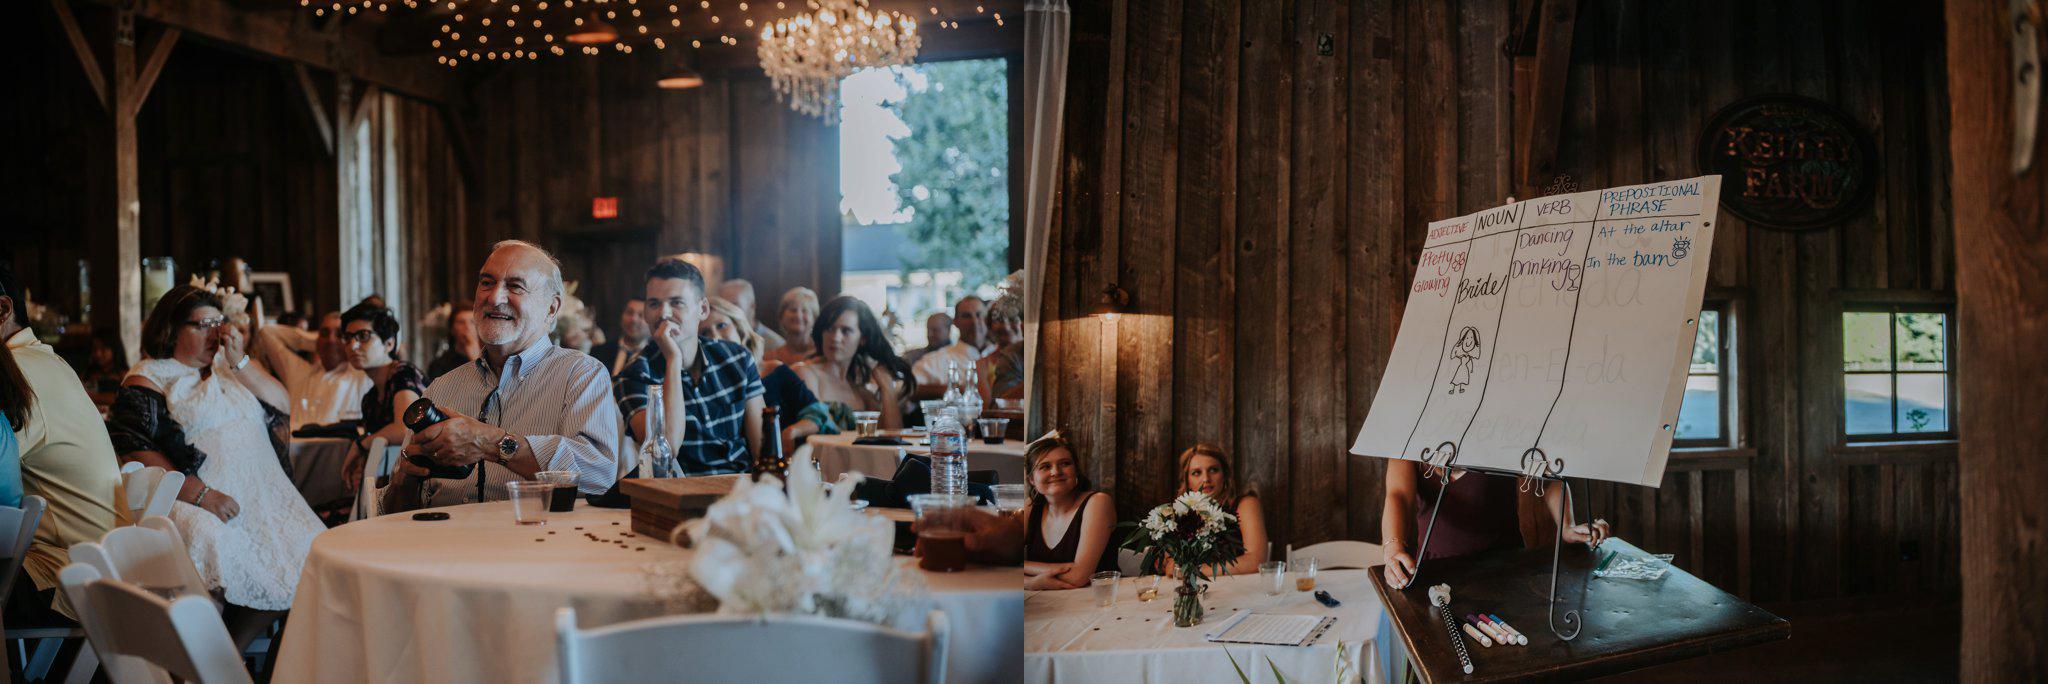 kristen-and-cody-the-kelley-farm-wedding-seattle-photographer-caitlyn-nikula-82.jpg